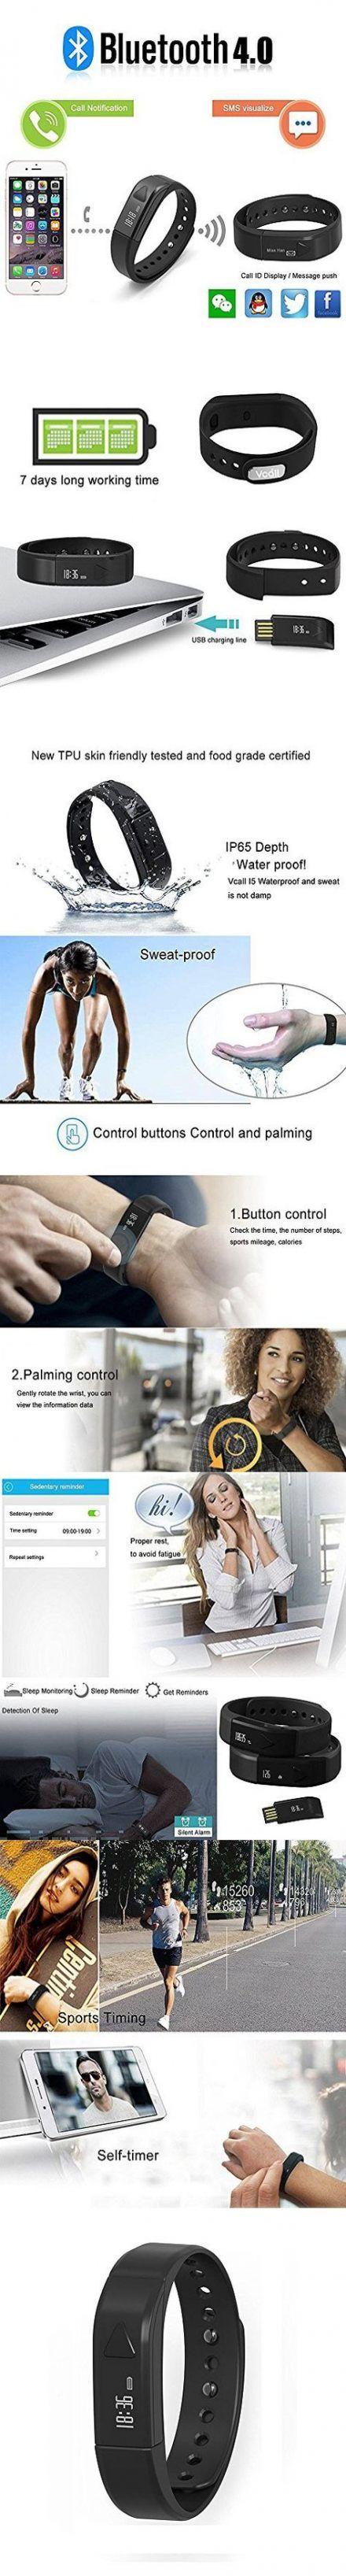 Fitness tracker watch phones 47 Ideas #fitness